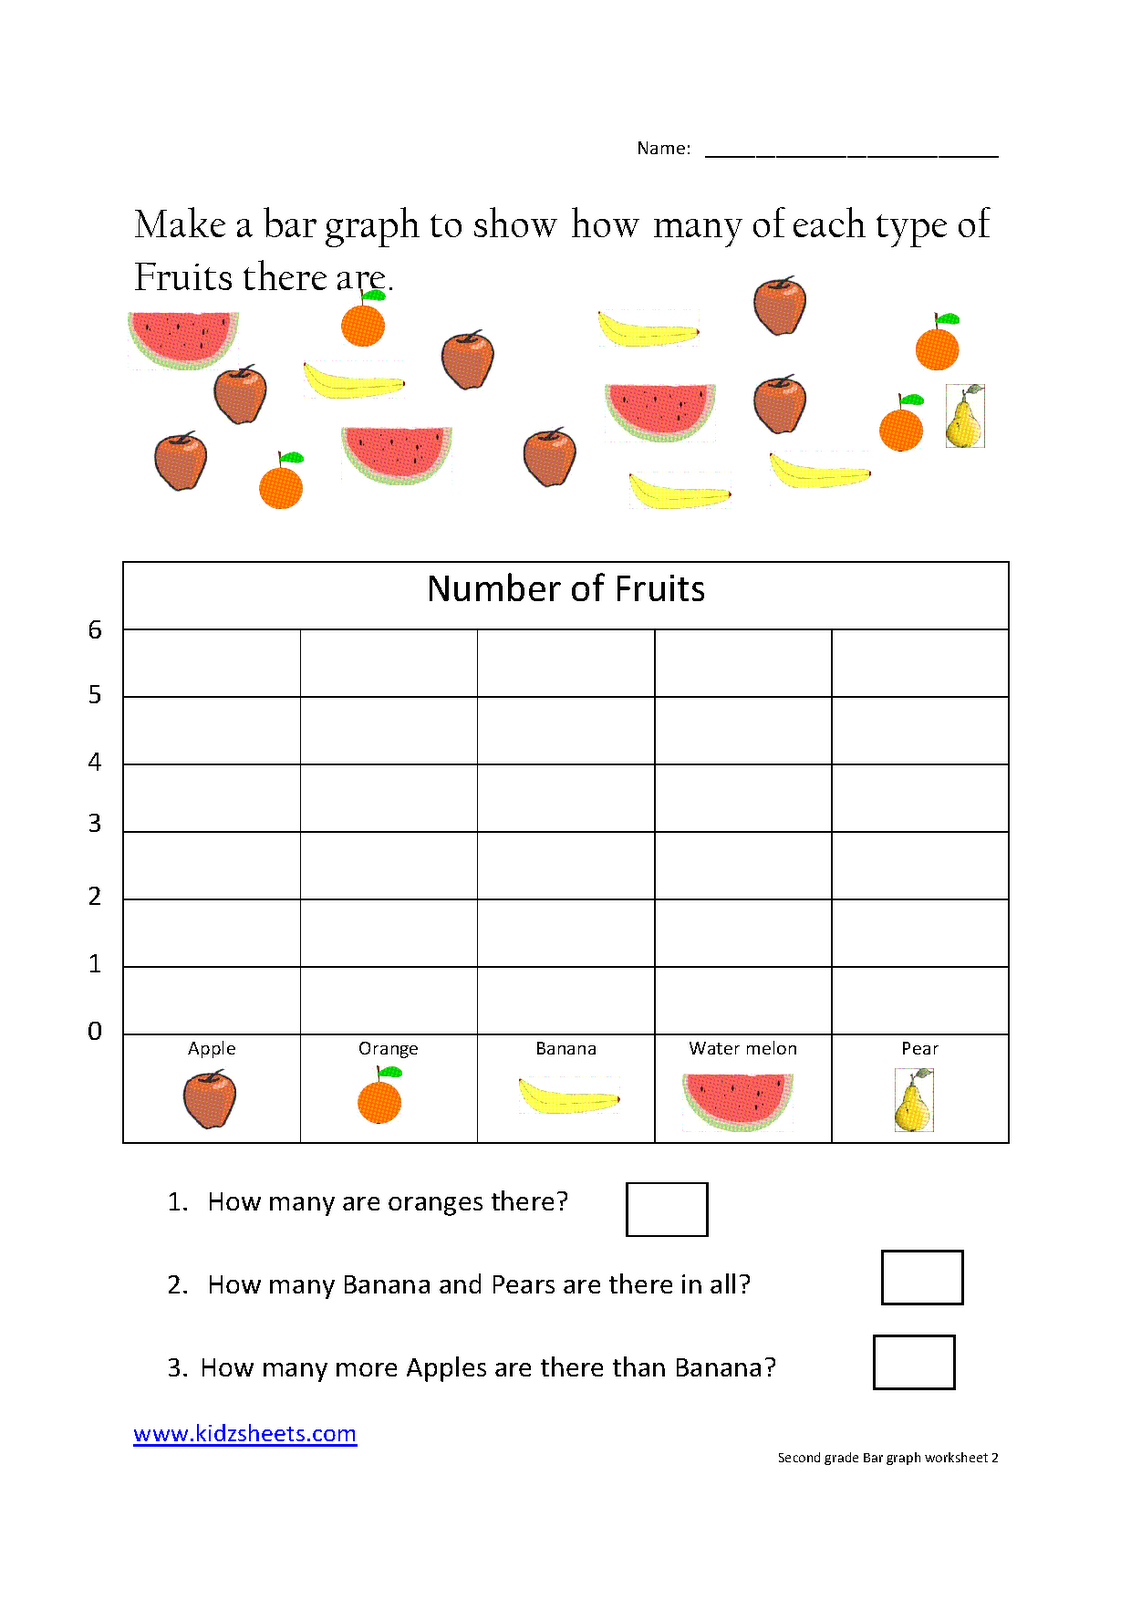 Worksheets Bar Graph Worksheets kidz worksheets second grade bar graph worksheet2 graph